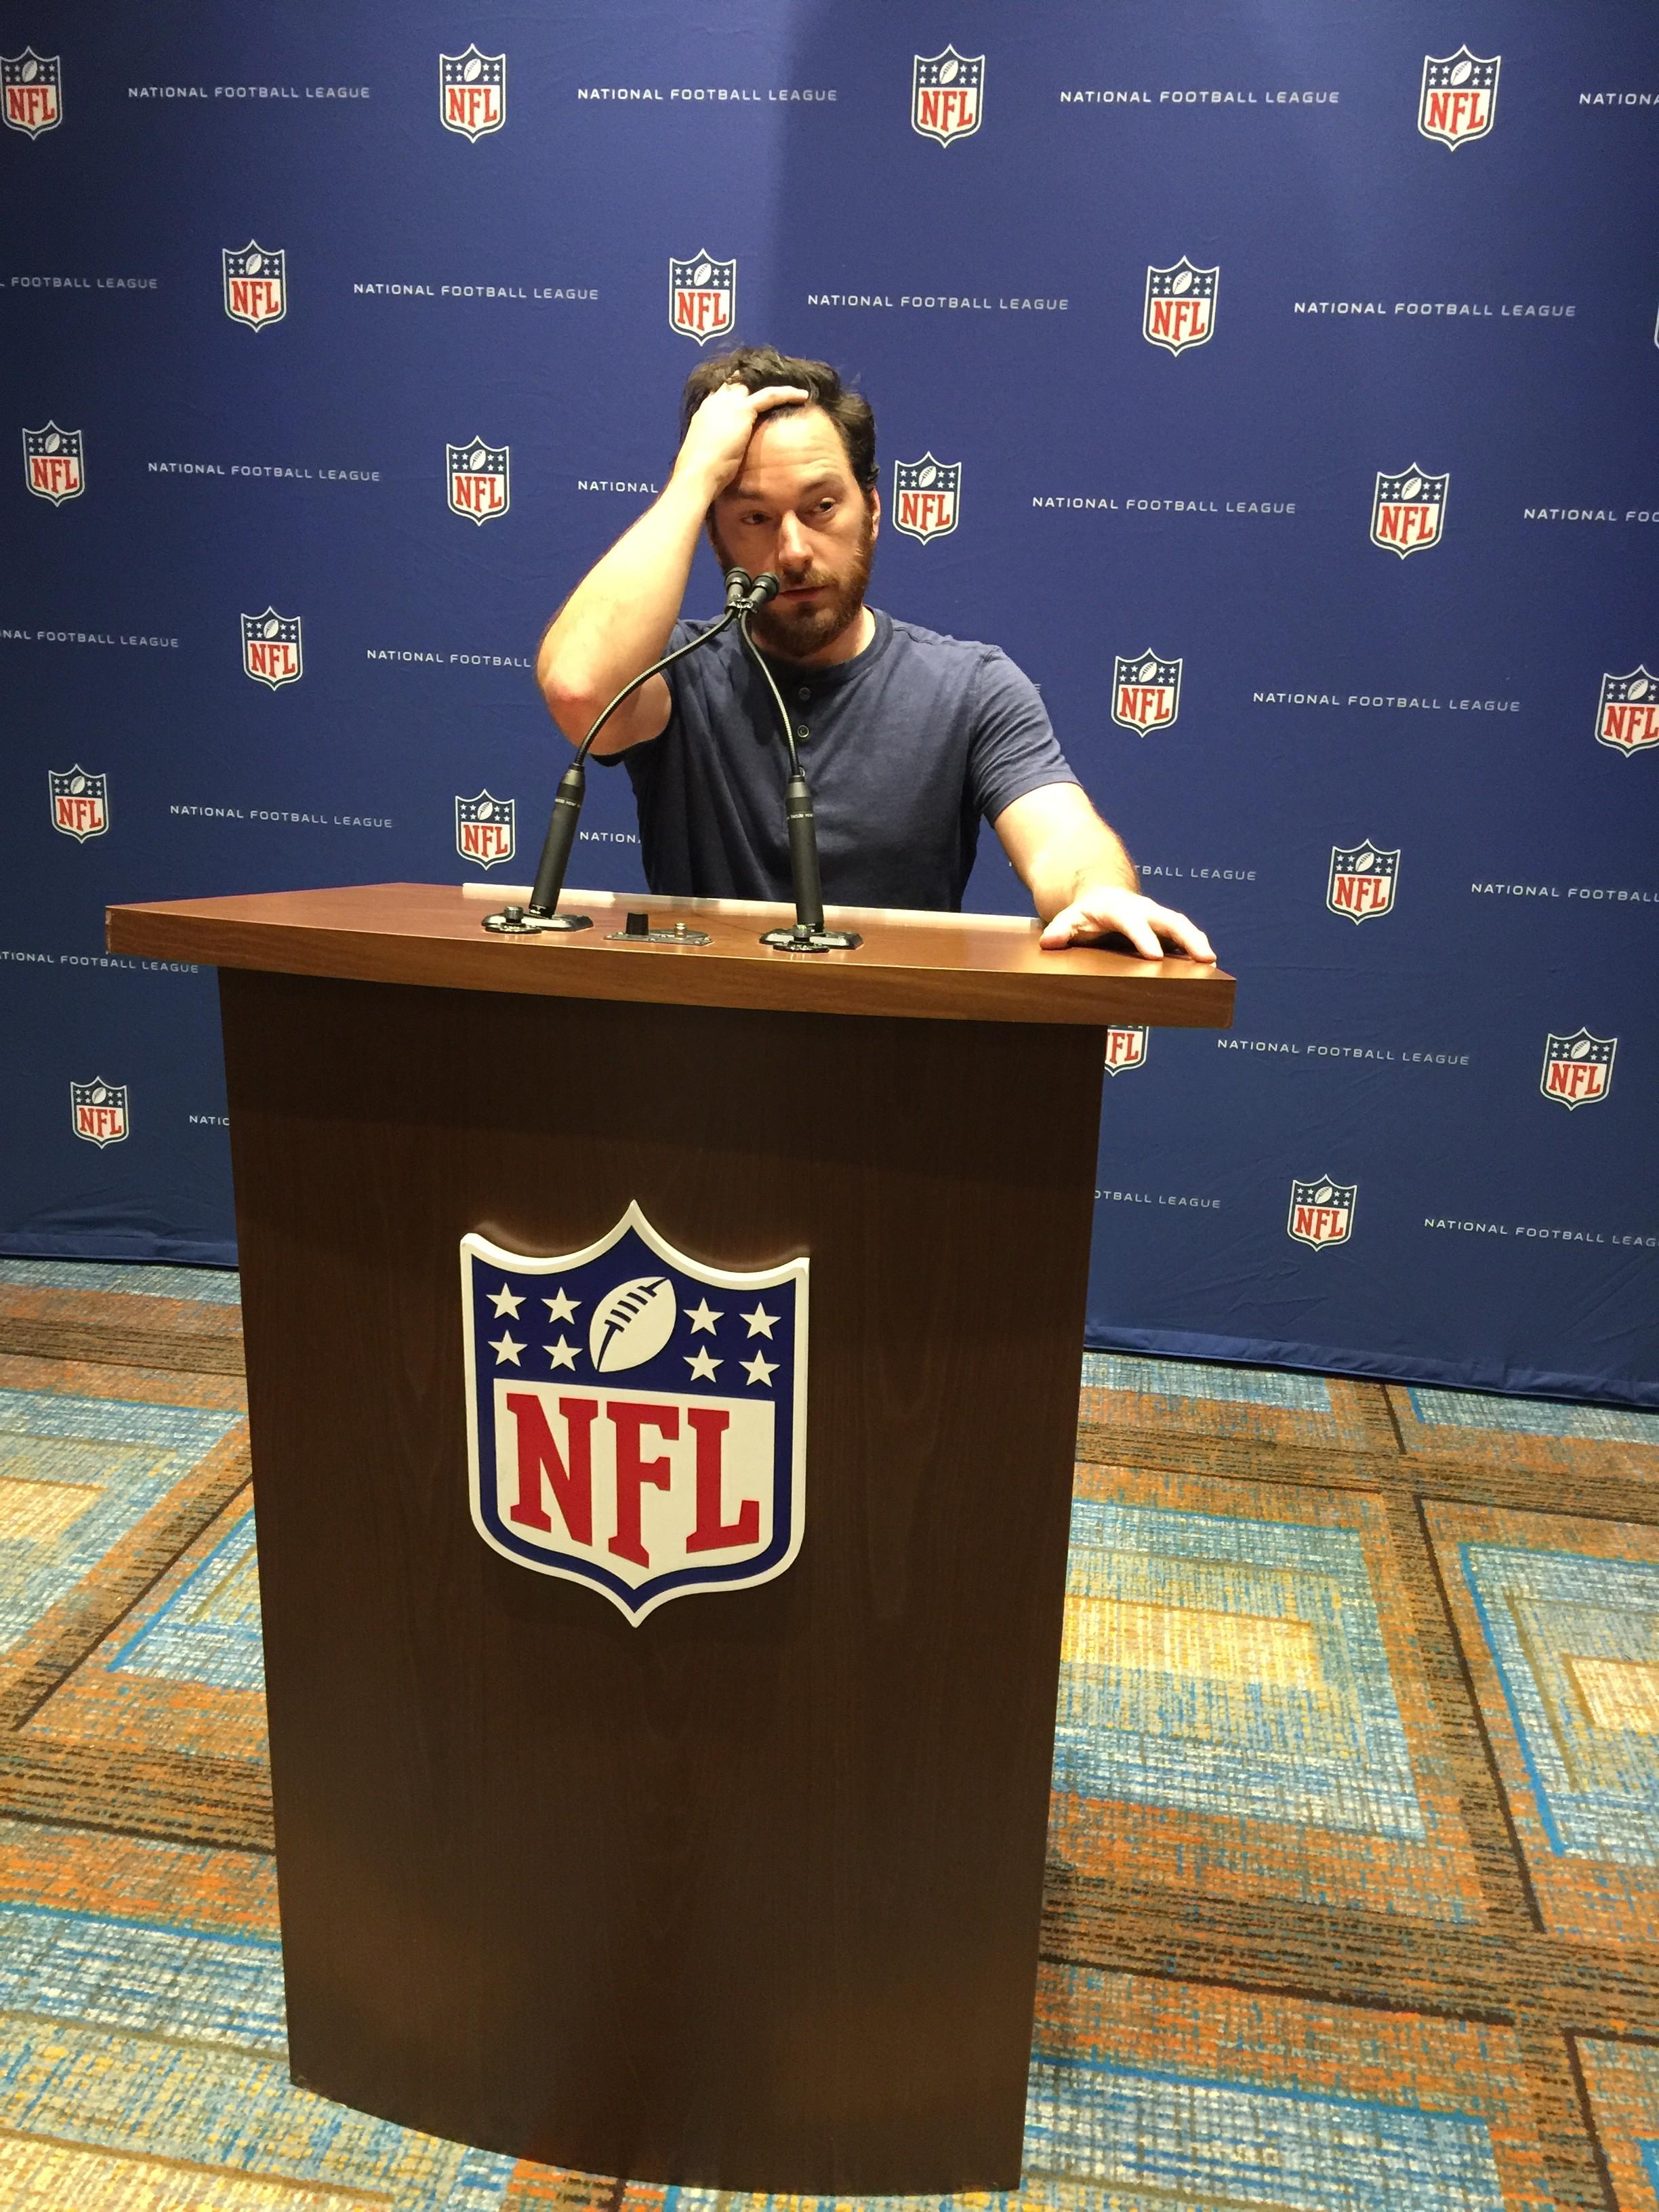 Nashville and Denver Crews Channel Their Inner NFL Player for ESPN